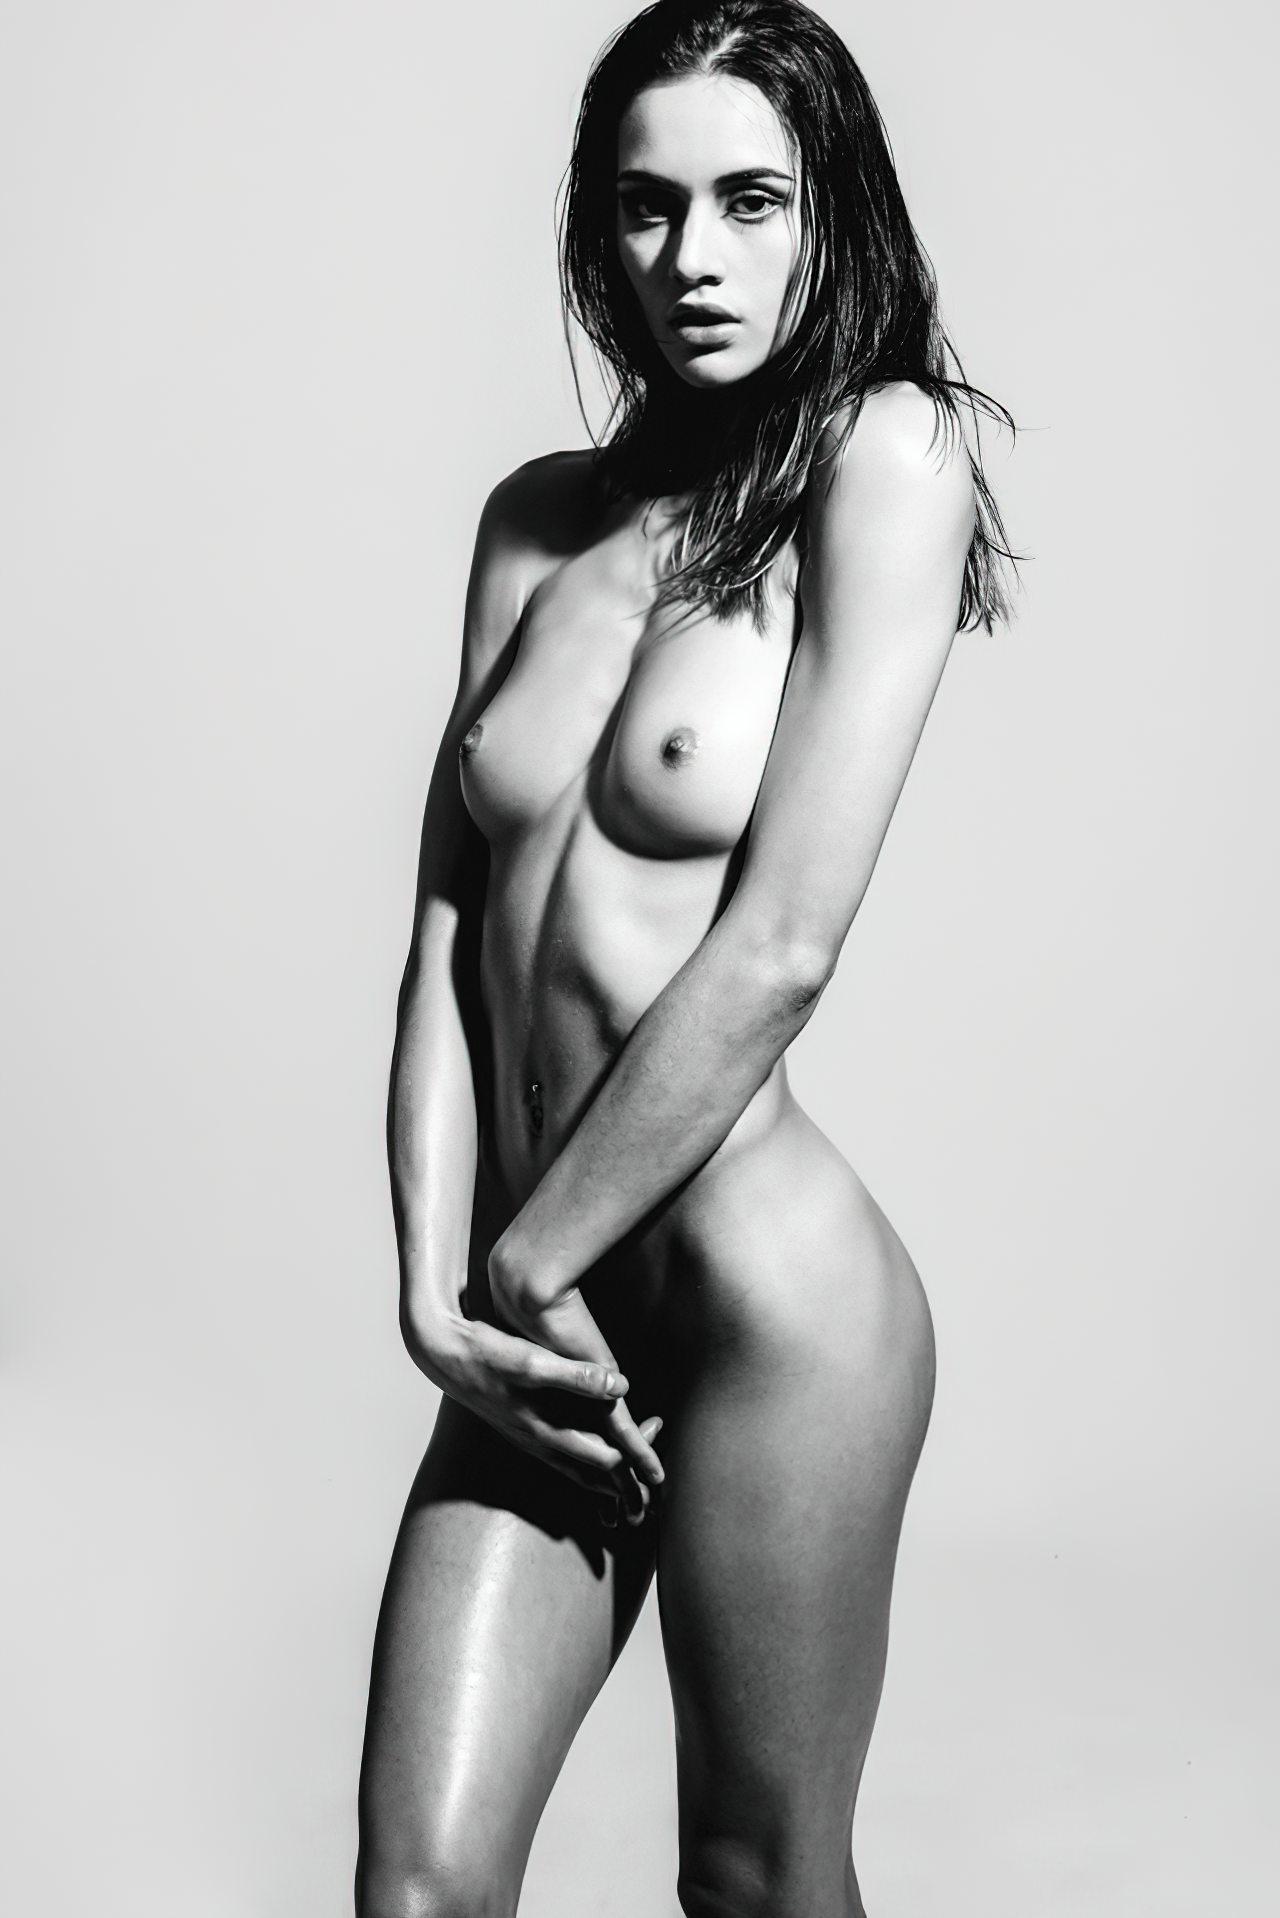 Fotos Mulheres Despidas (46)